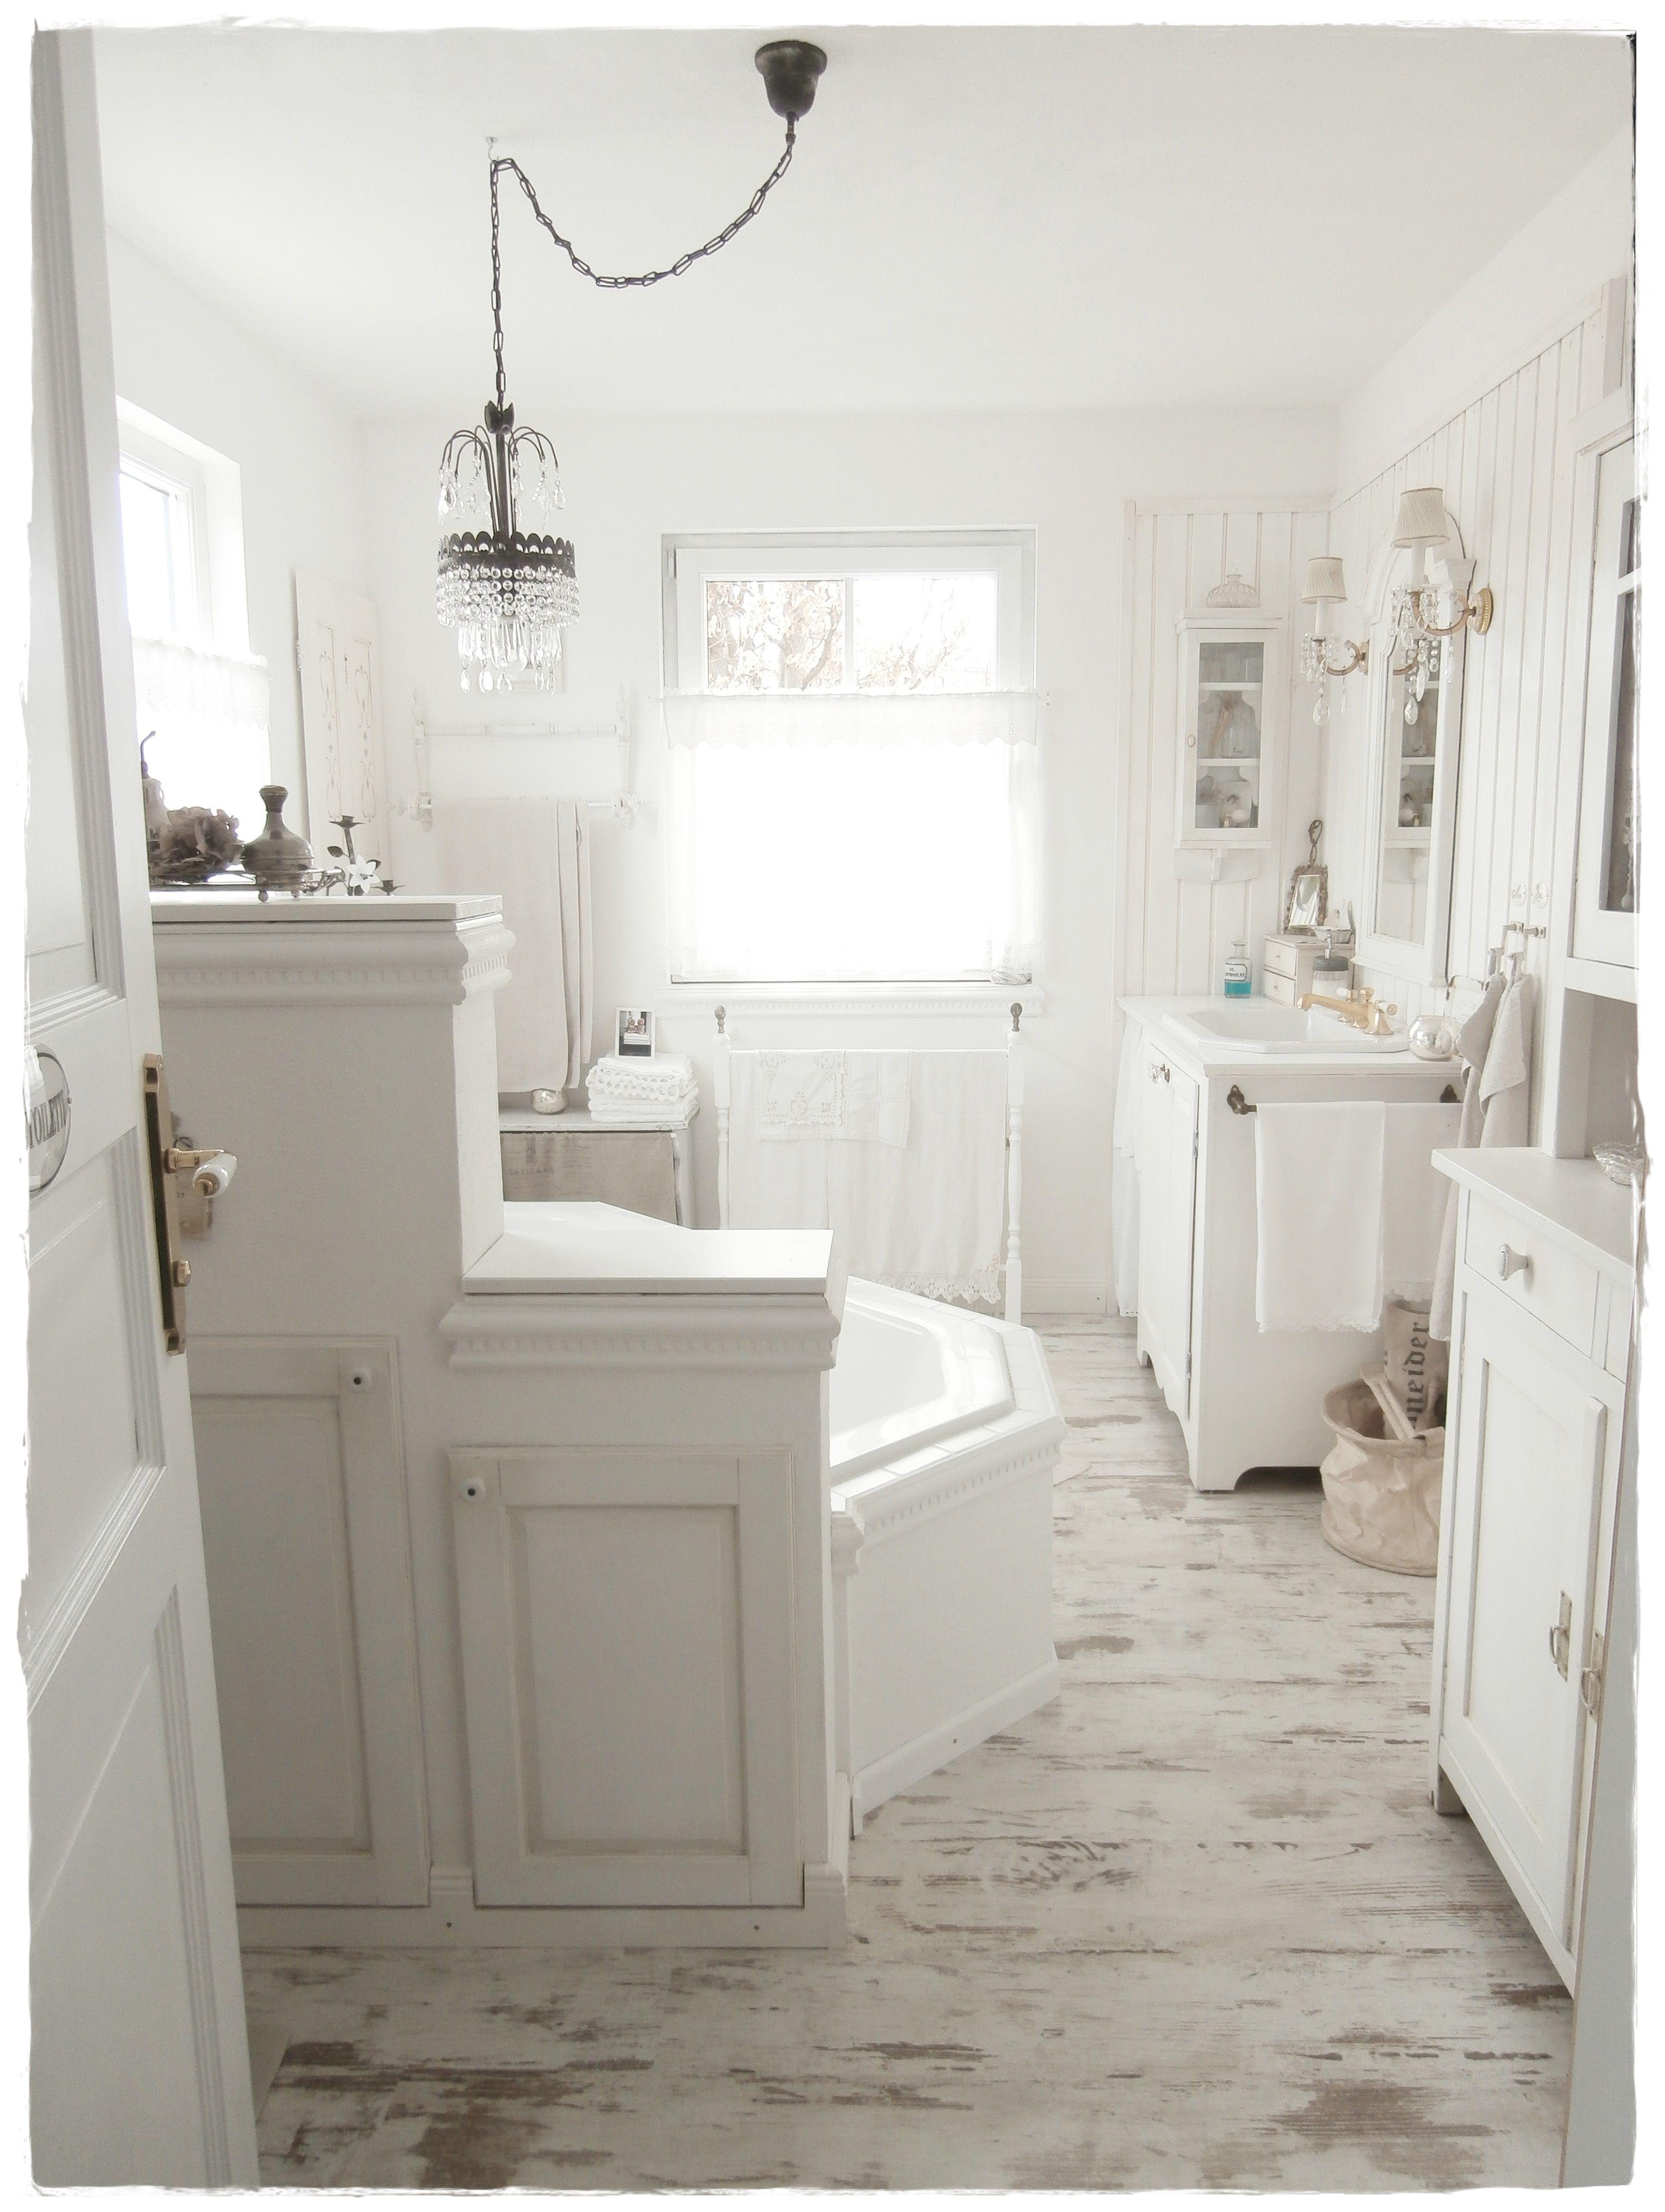 Bathroom shabbylandhaus shabbylandhaus badezimmer for Badezimmer landhausstil